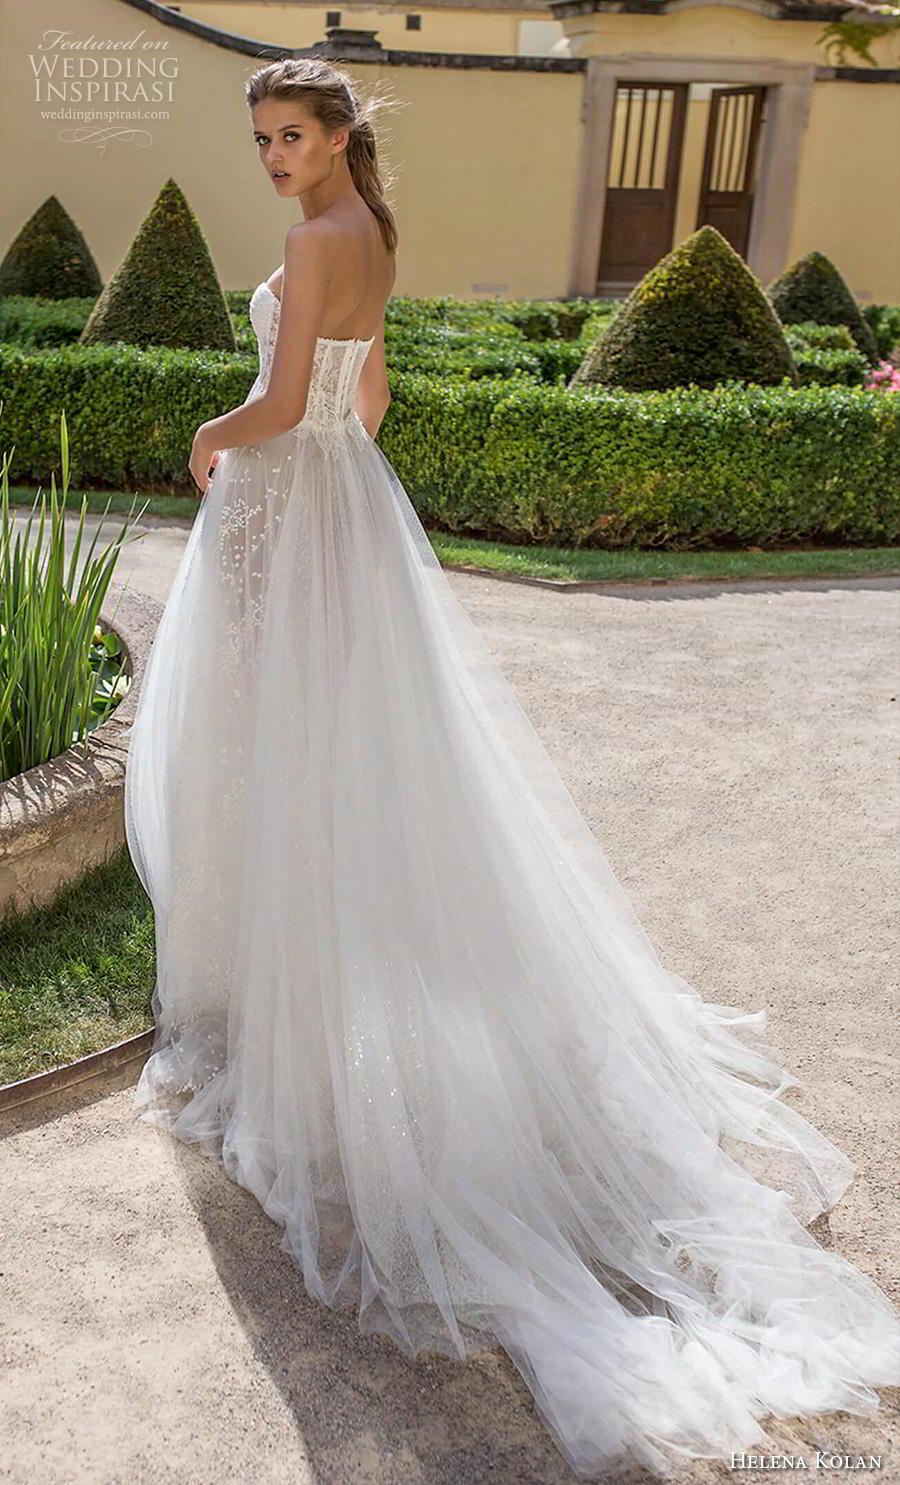 helena kolan 2019 bridal strapless sweetheart neckline full embellishment bustier romantic soft a  line wedding dress mid back chapel train (1) bv